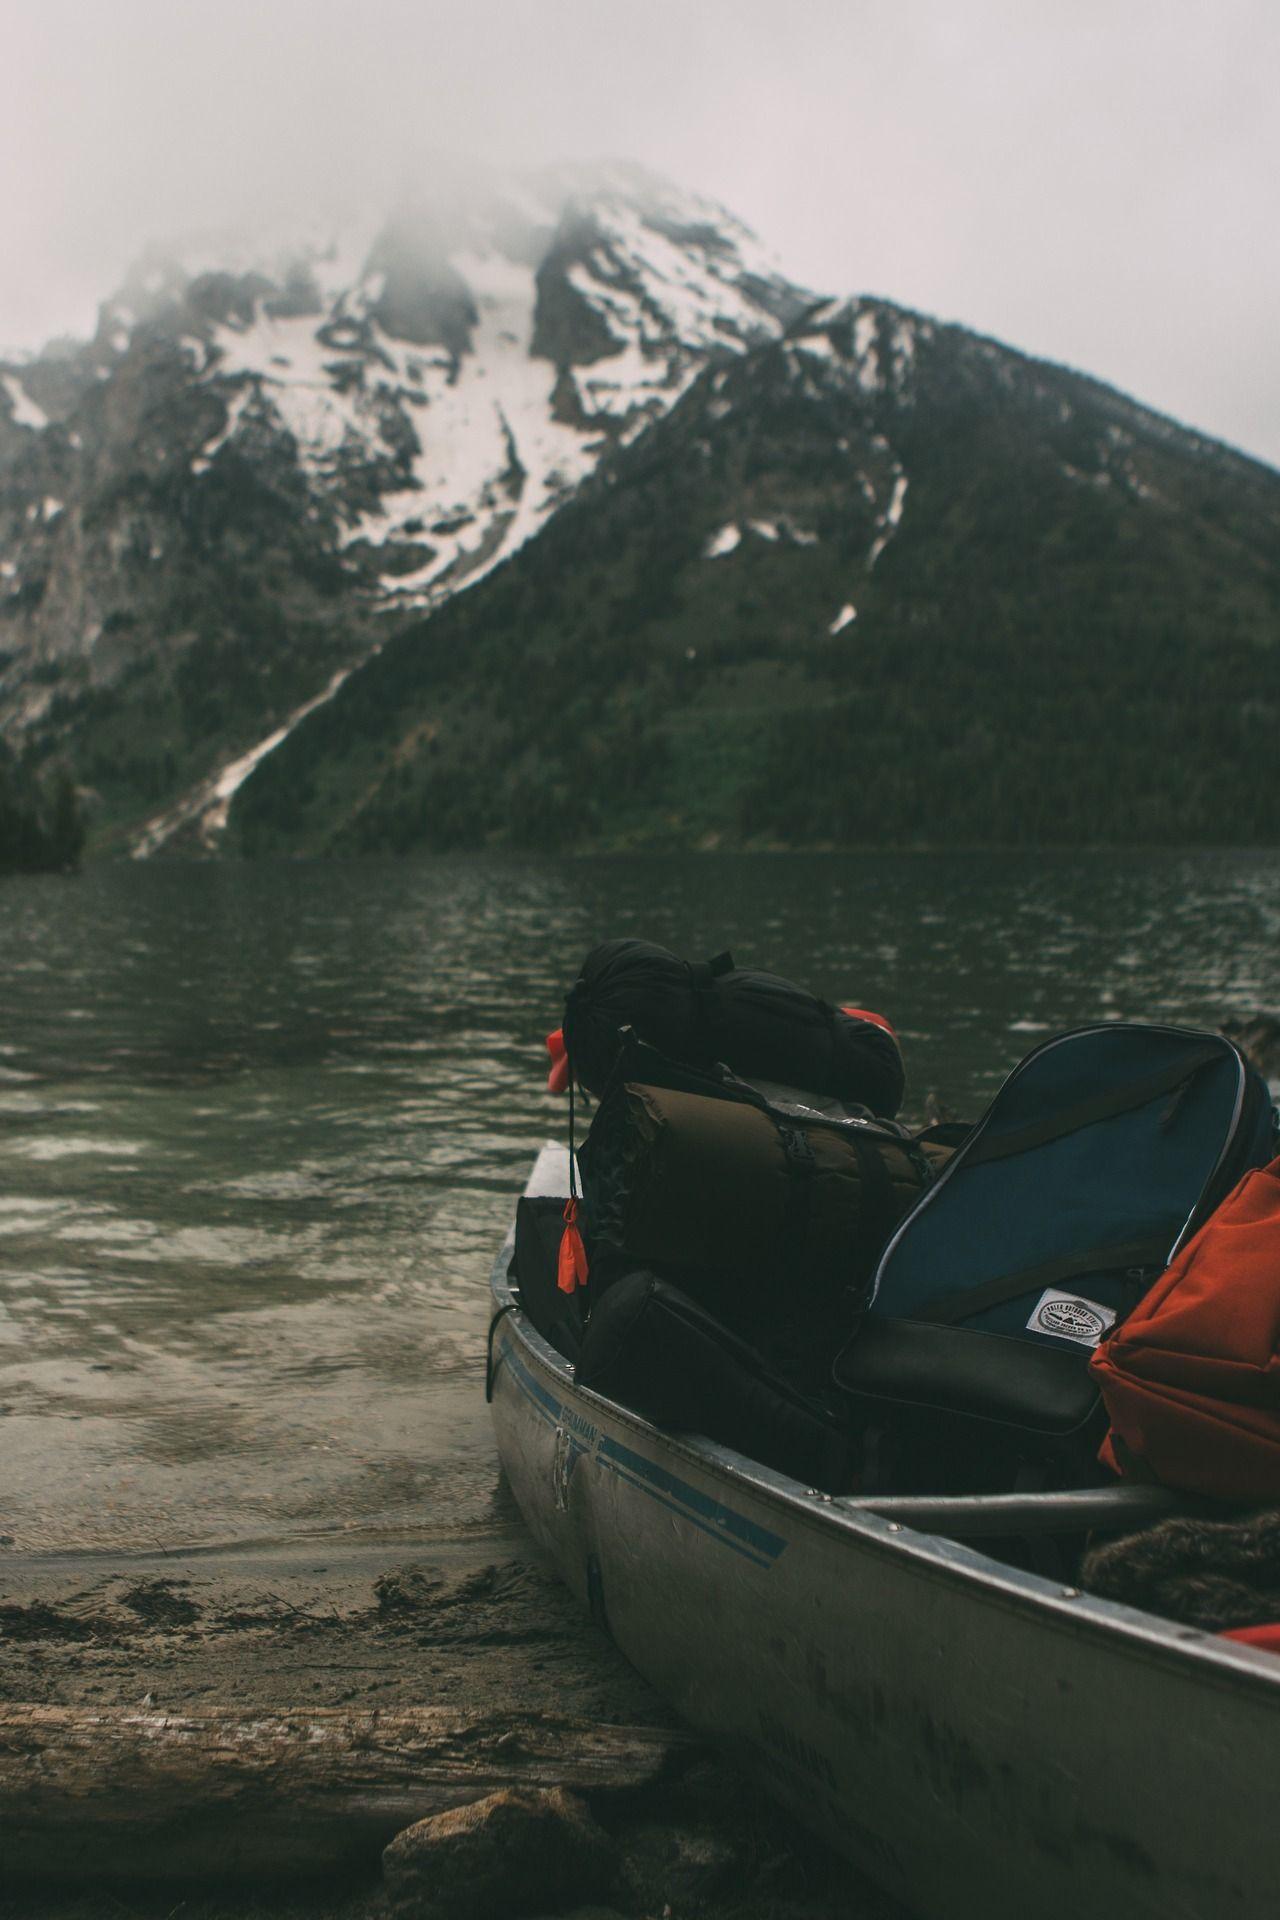 Boat amongst mountains